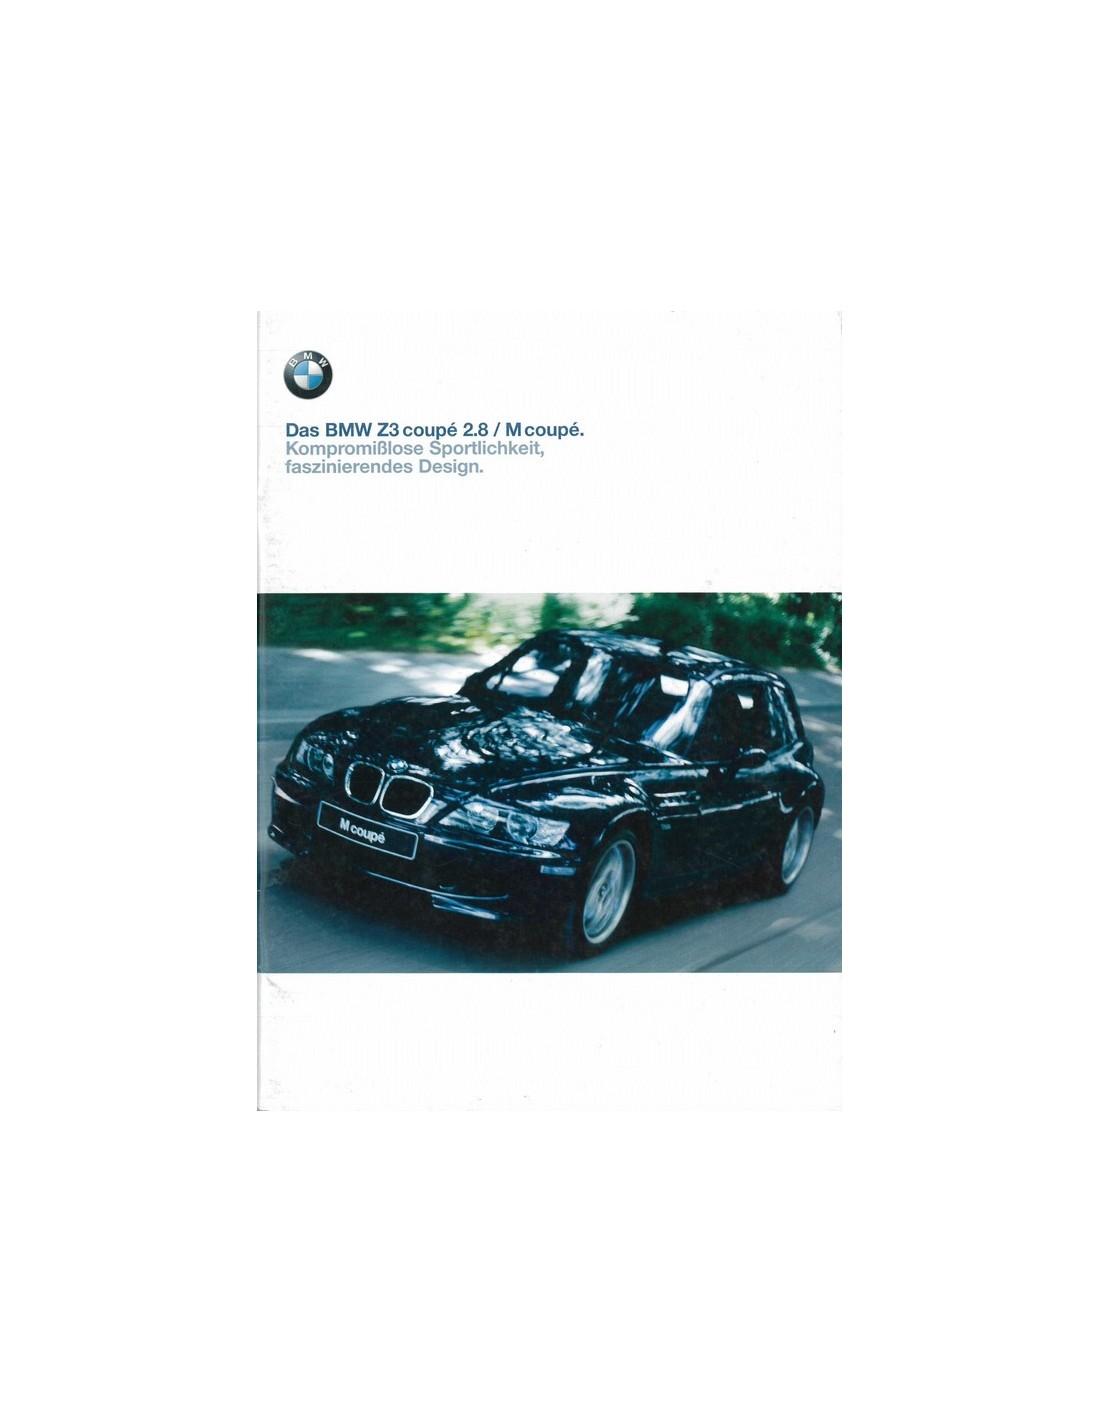 1999 Bmw Z3 M Coupe Brochure German